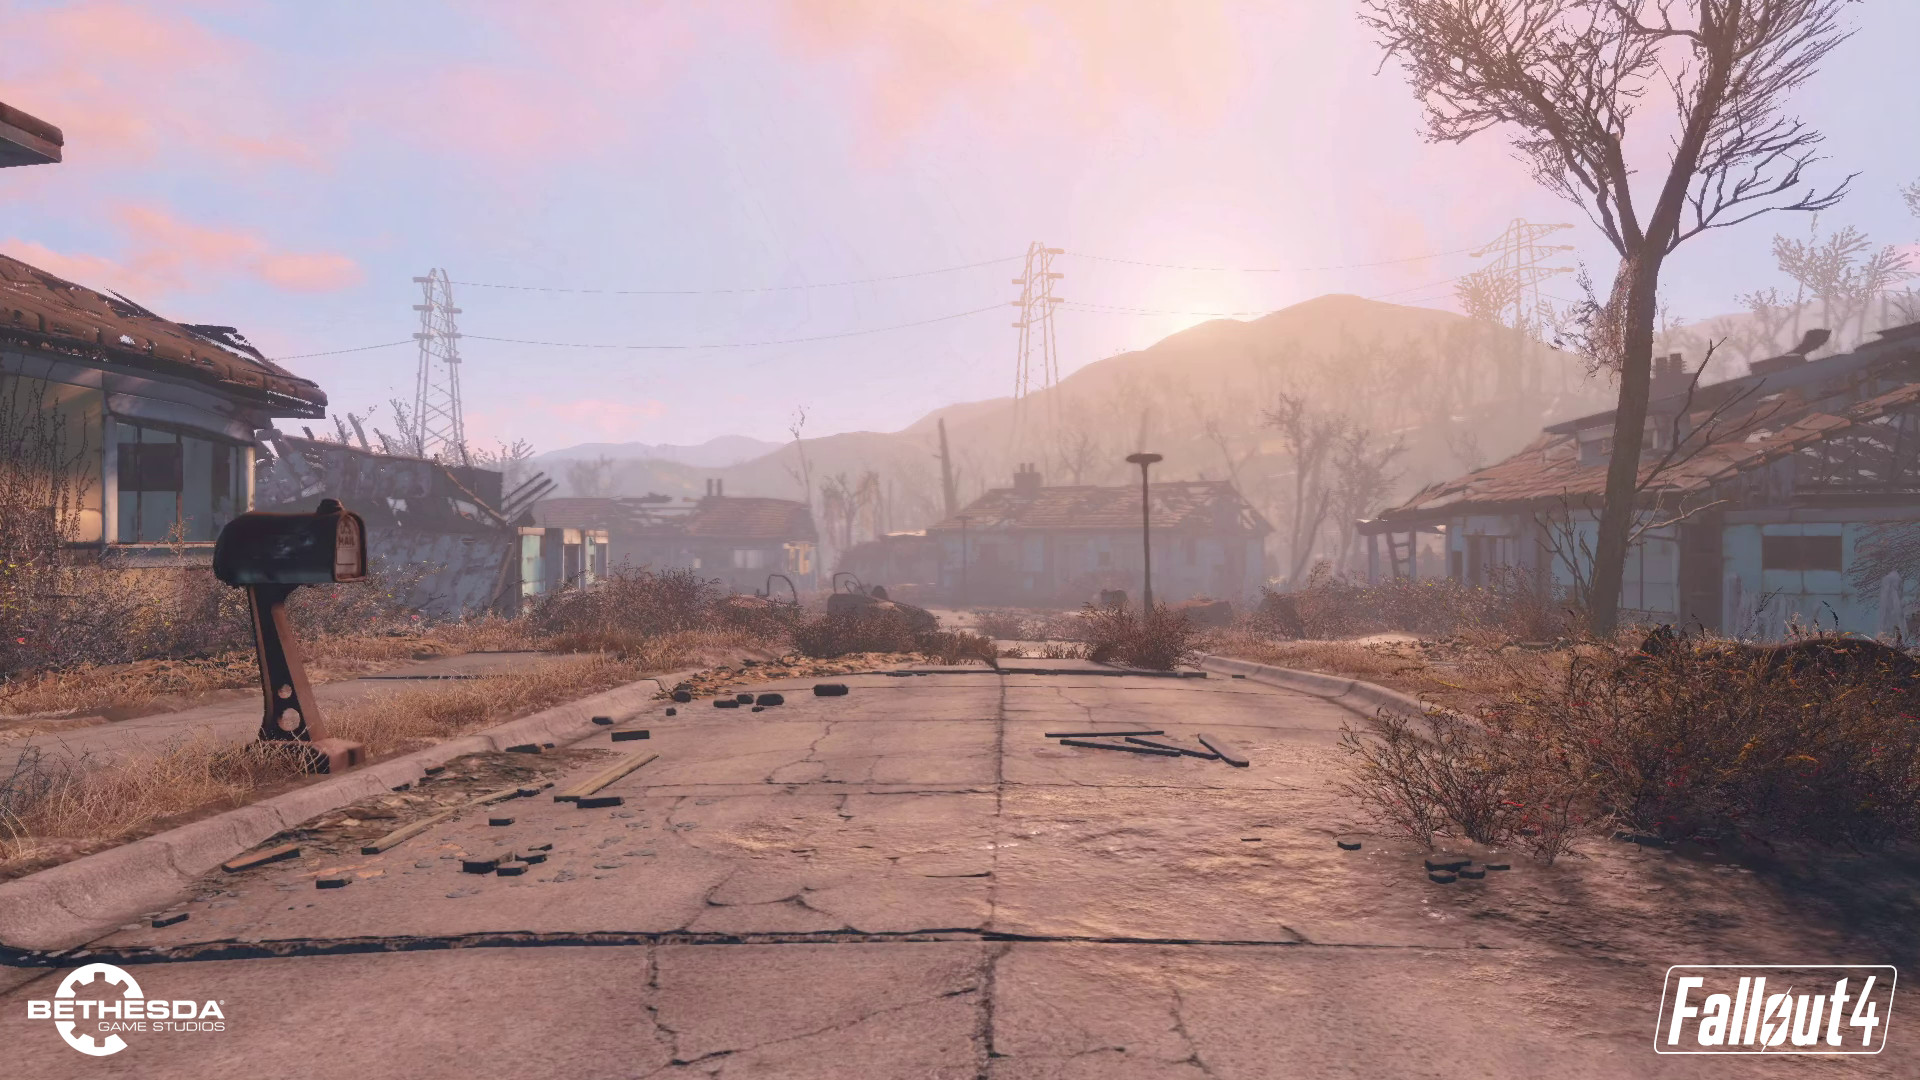 Fallout 4 – Wallpaper Attempts